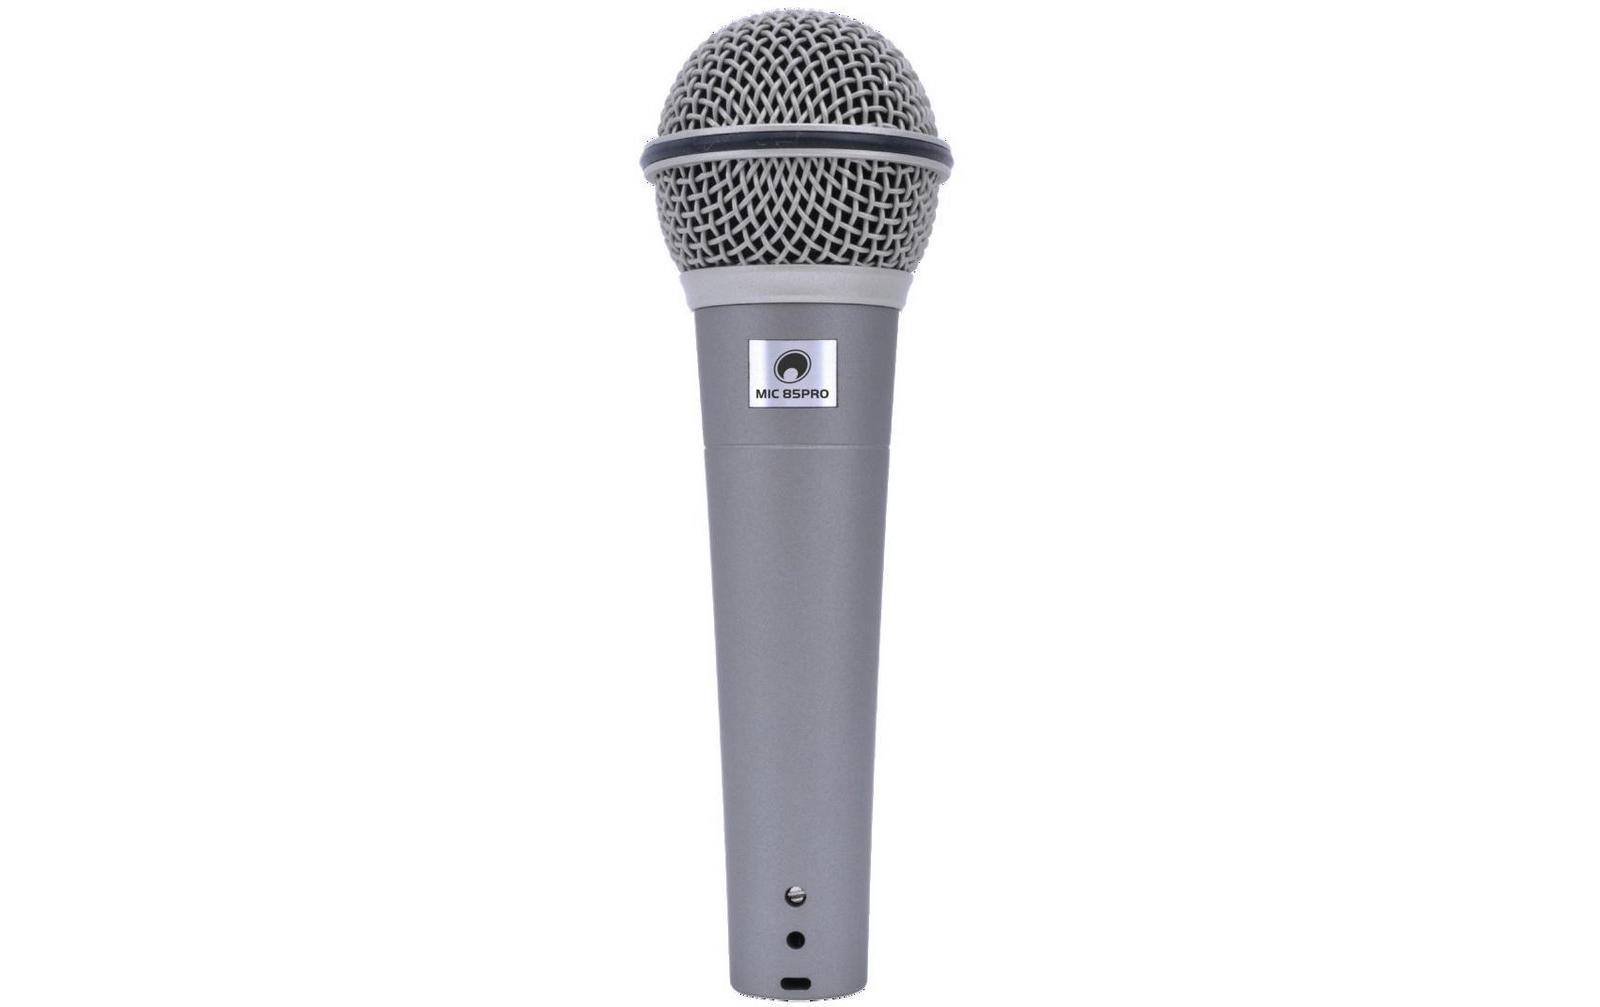 omnitronic-mic-85pro-dynamisches-mikrofon